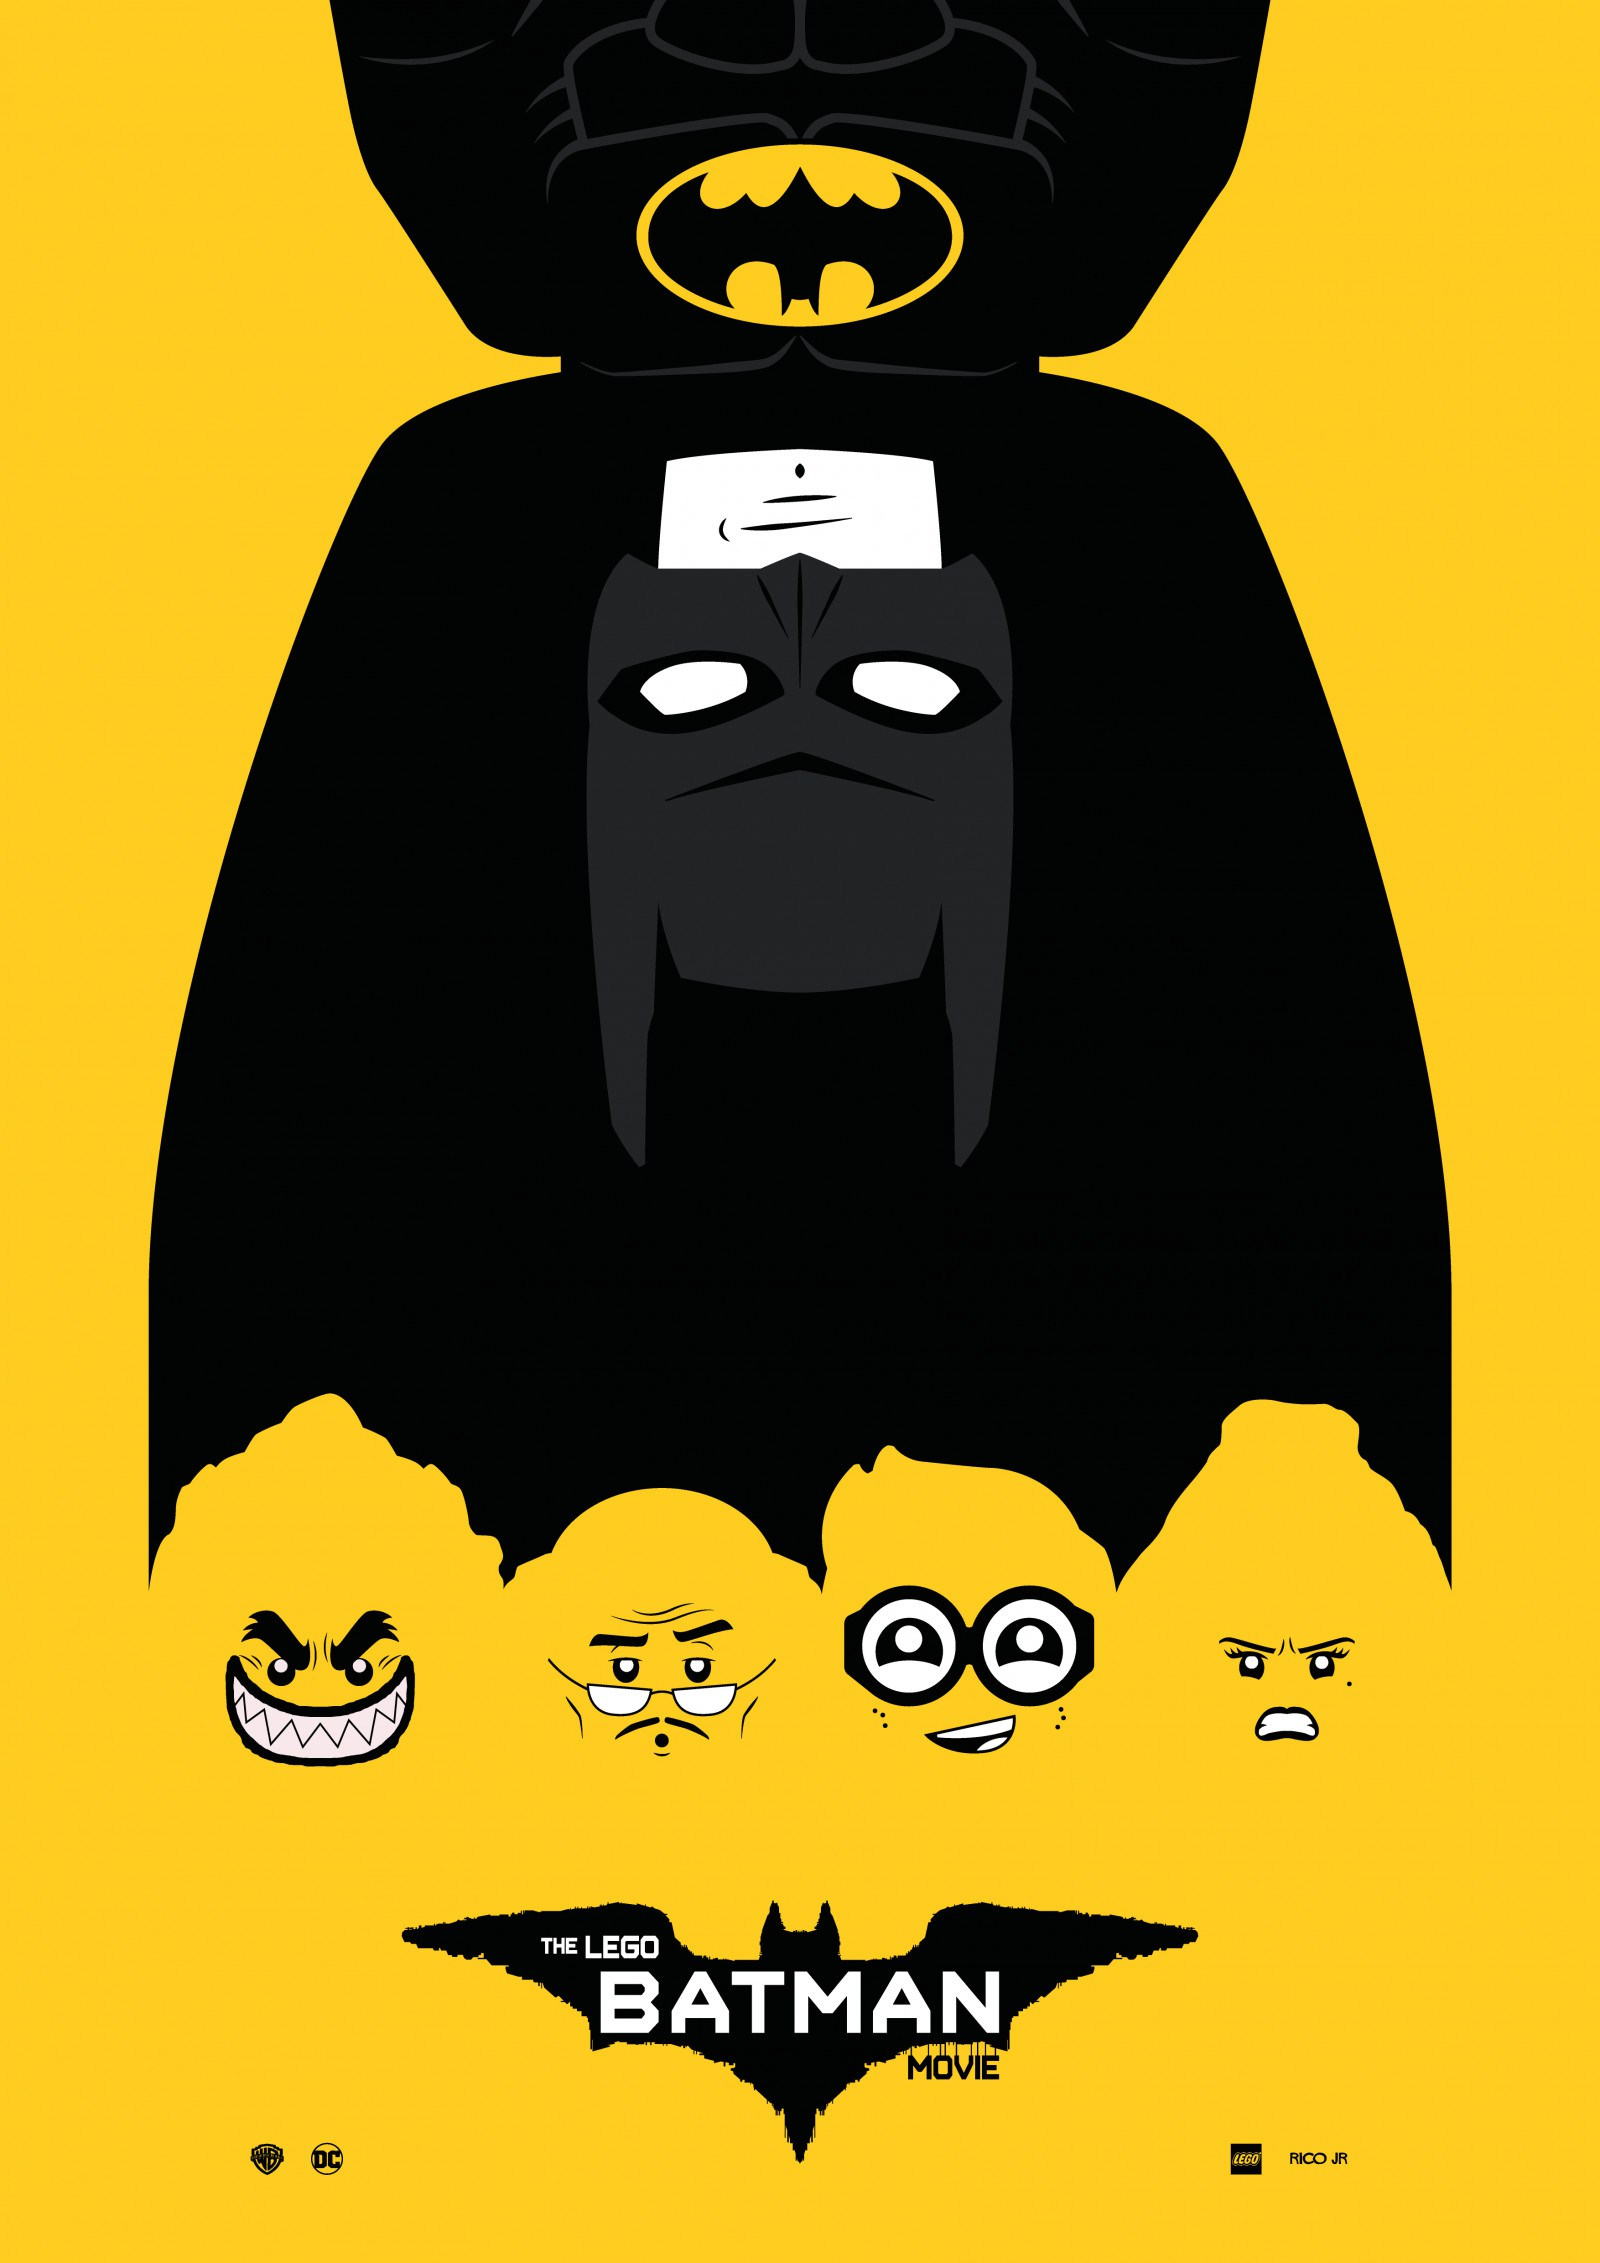 Lego Batman Wallpapers For Phone Batman 113462 Hd Wallpaper Backgrounds Download